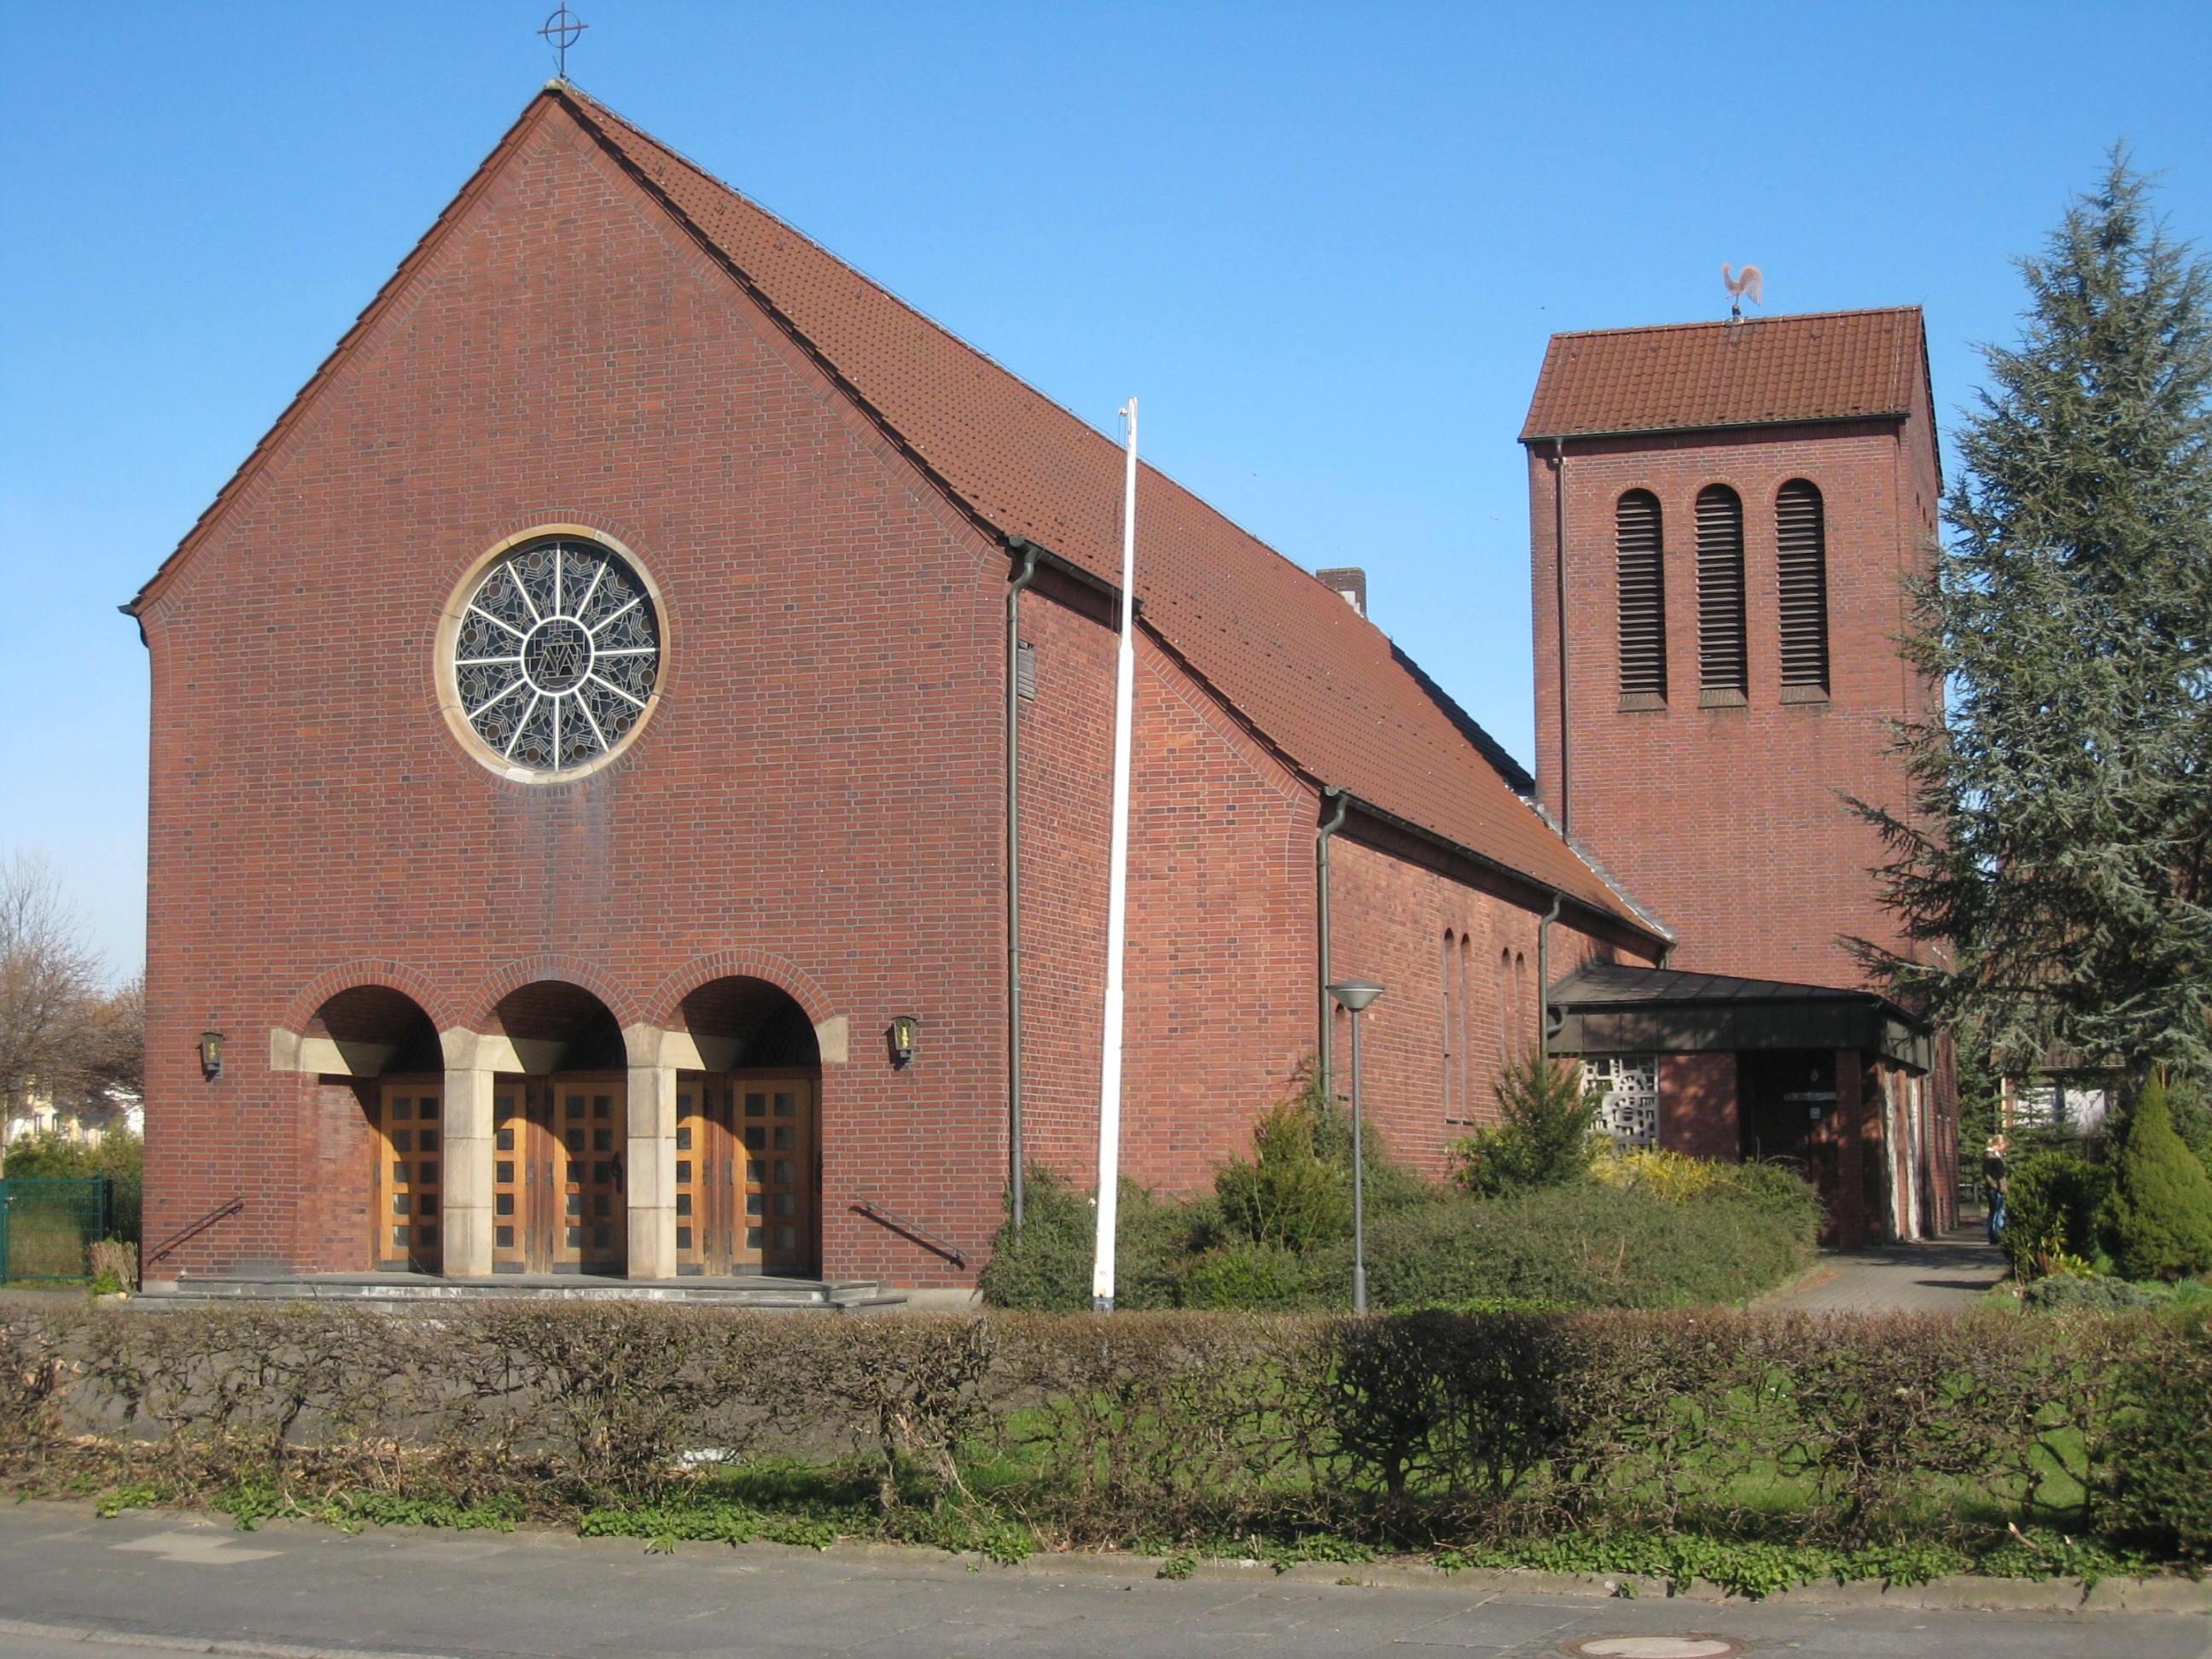 File:Kath. St. Immaculata Kirche Dortmund Scharnhorst.jpg